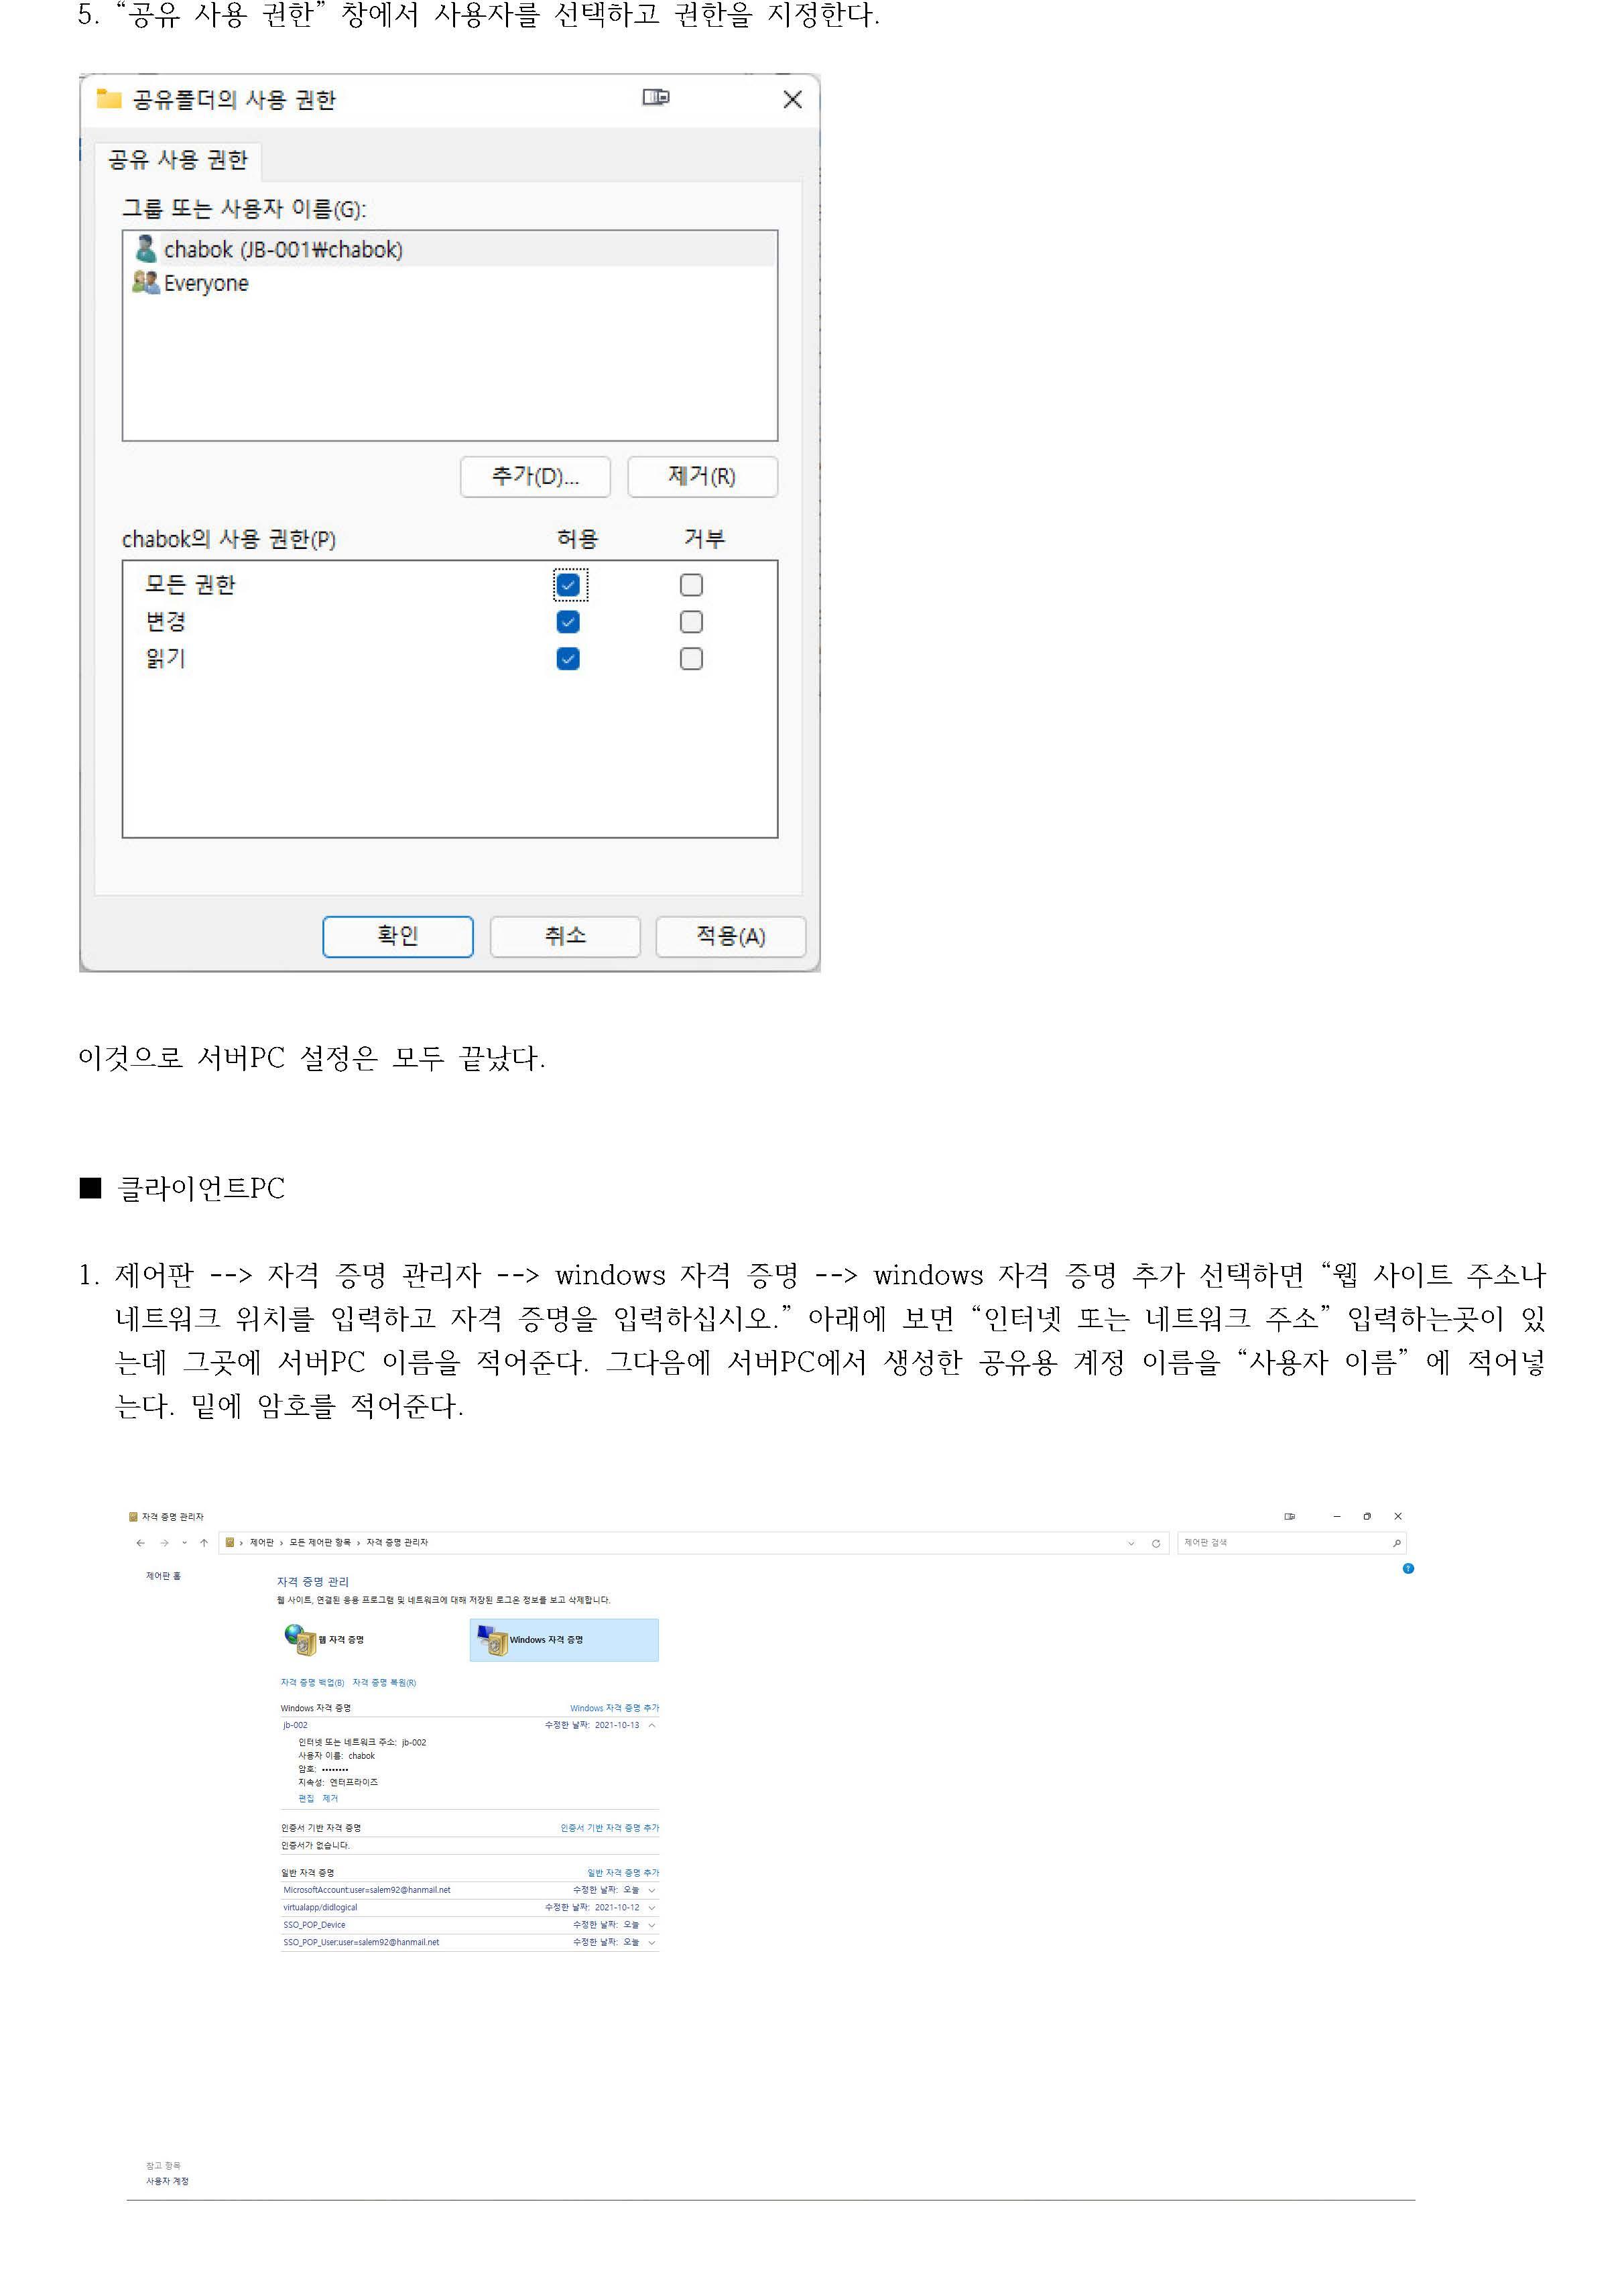 windows 11 자격증명으로 네트워크 공유하는법_페이지_3.jpg